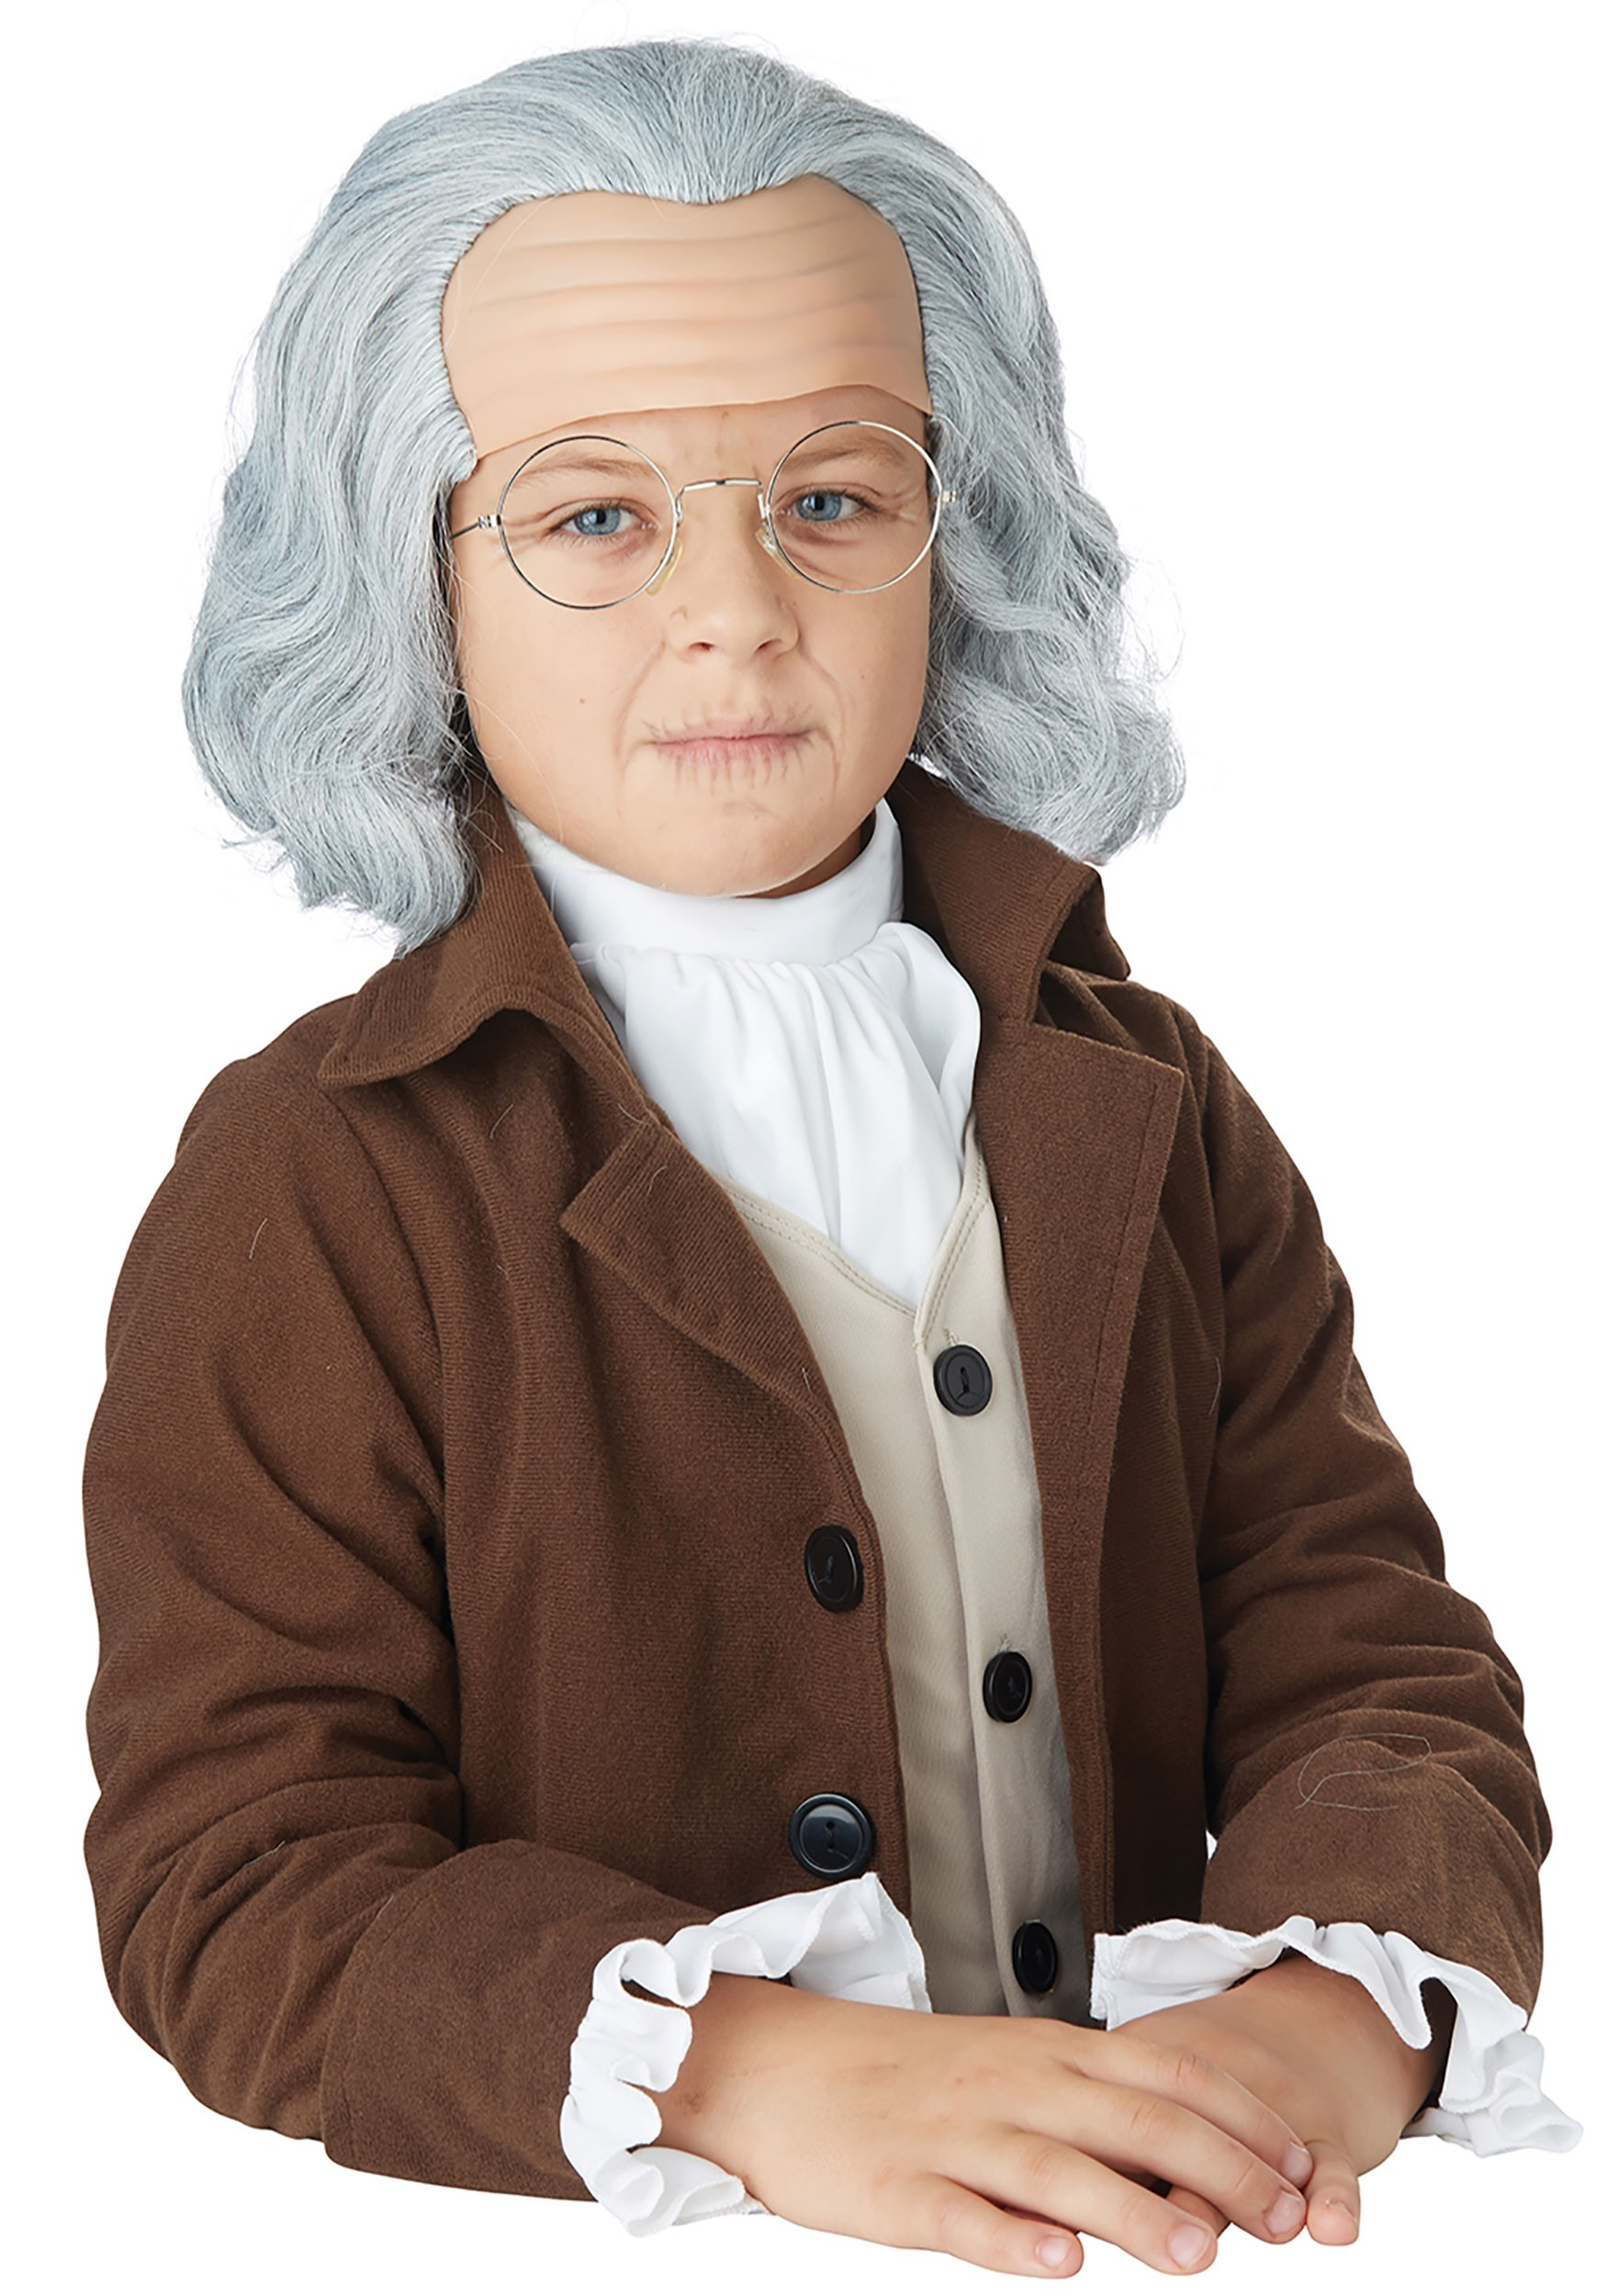 Child Benjamin Franklin Wig